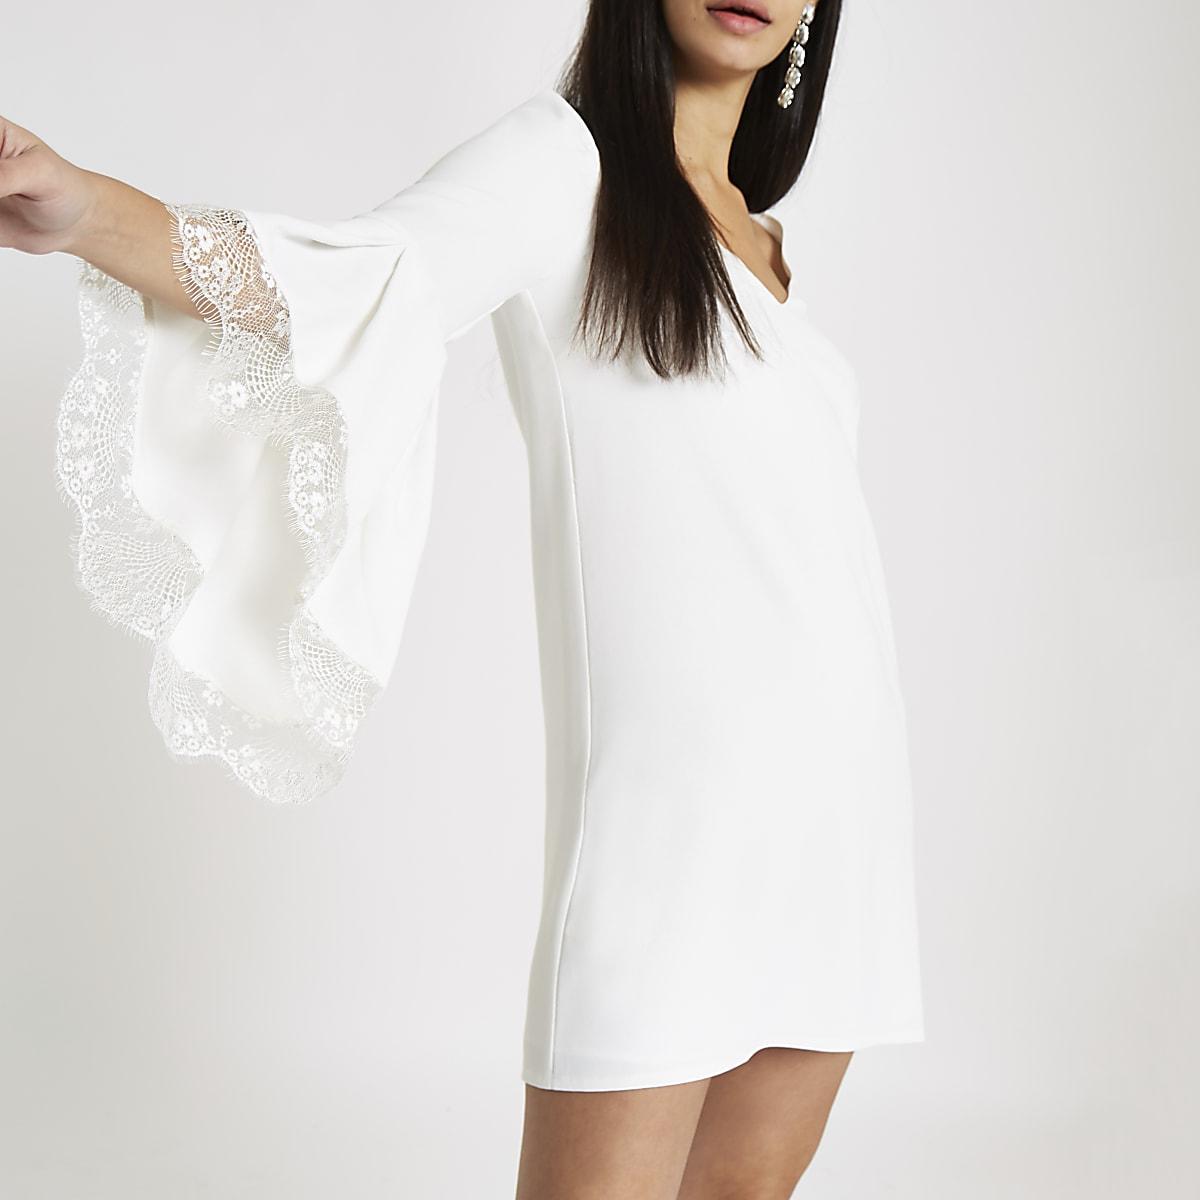 b83669548fba White lace trim flare sleeve swing dress - Swing Dresses - Dresses - women